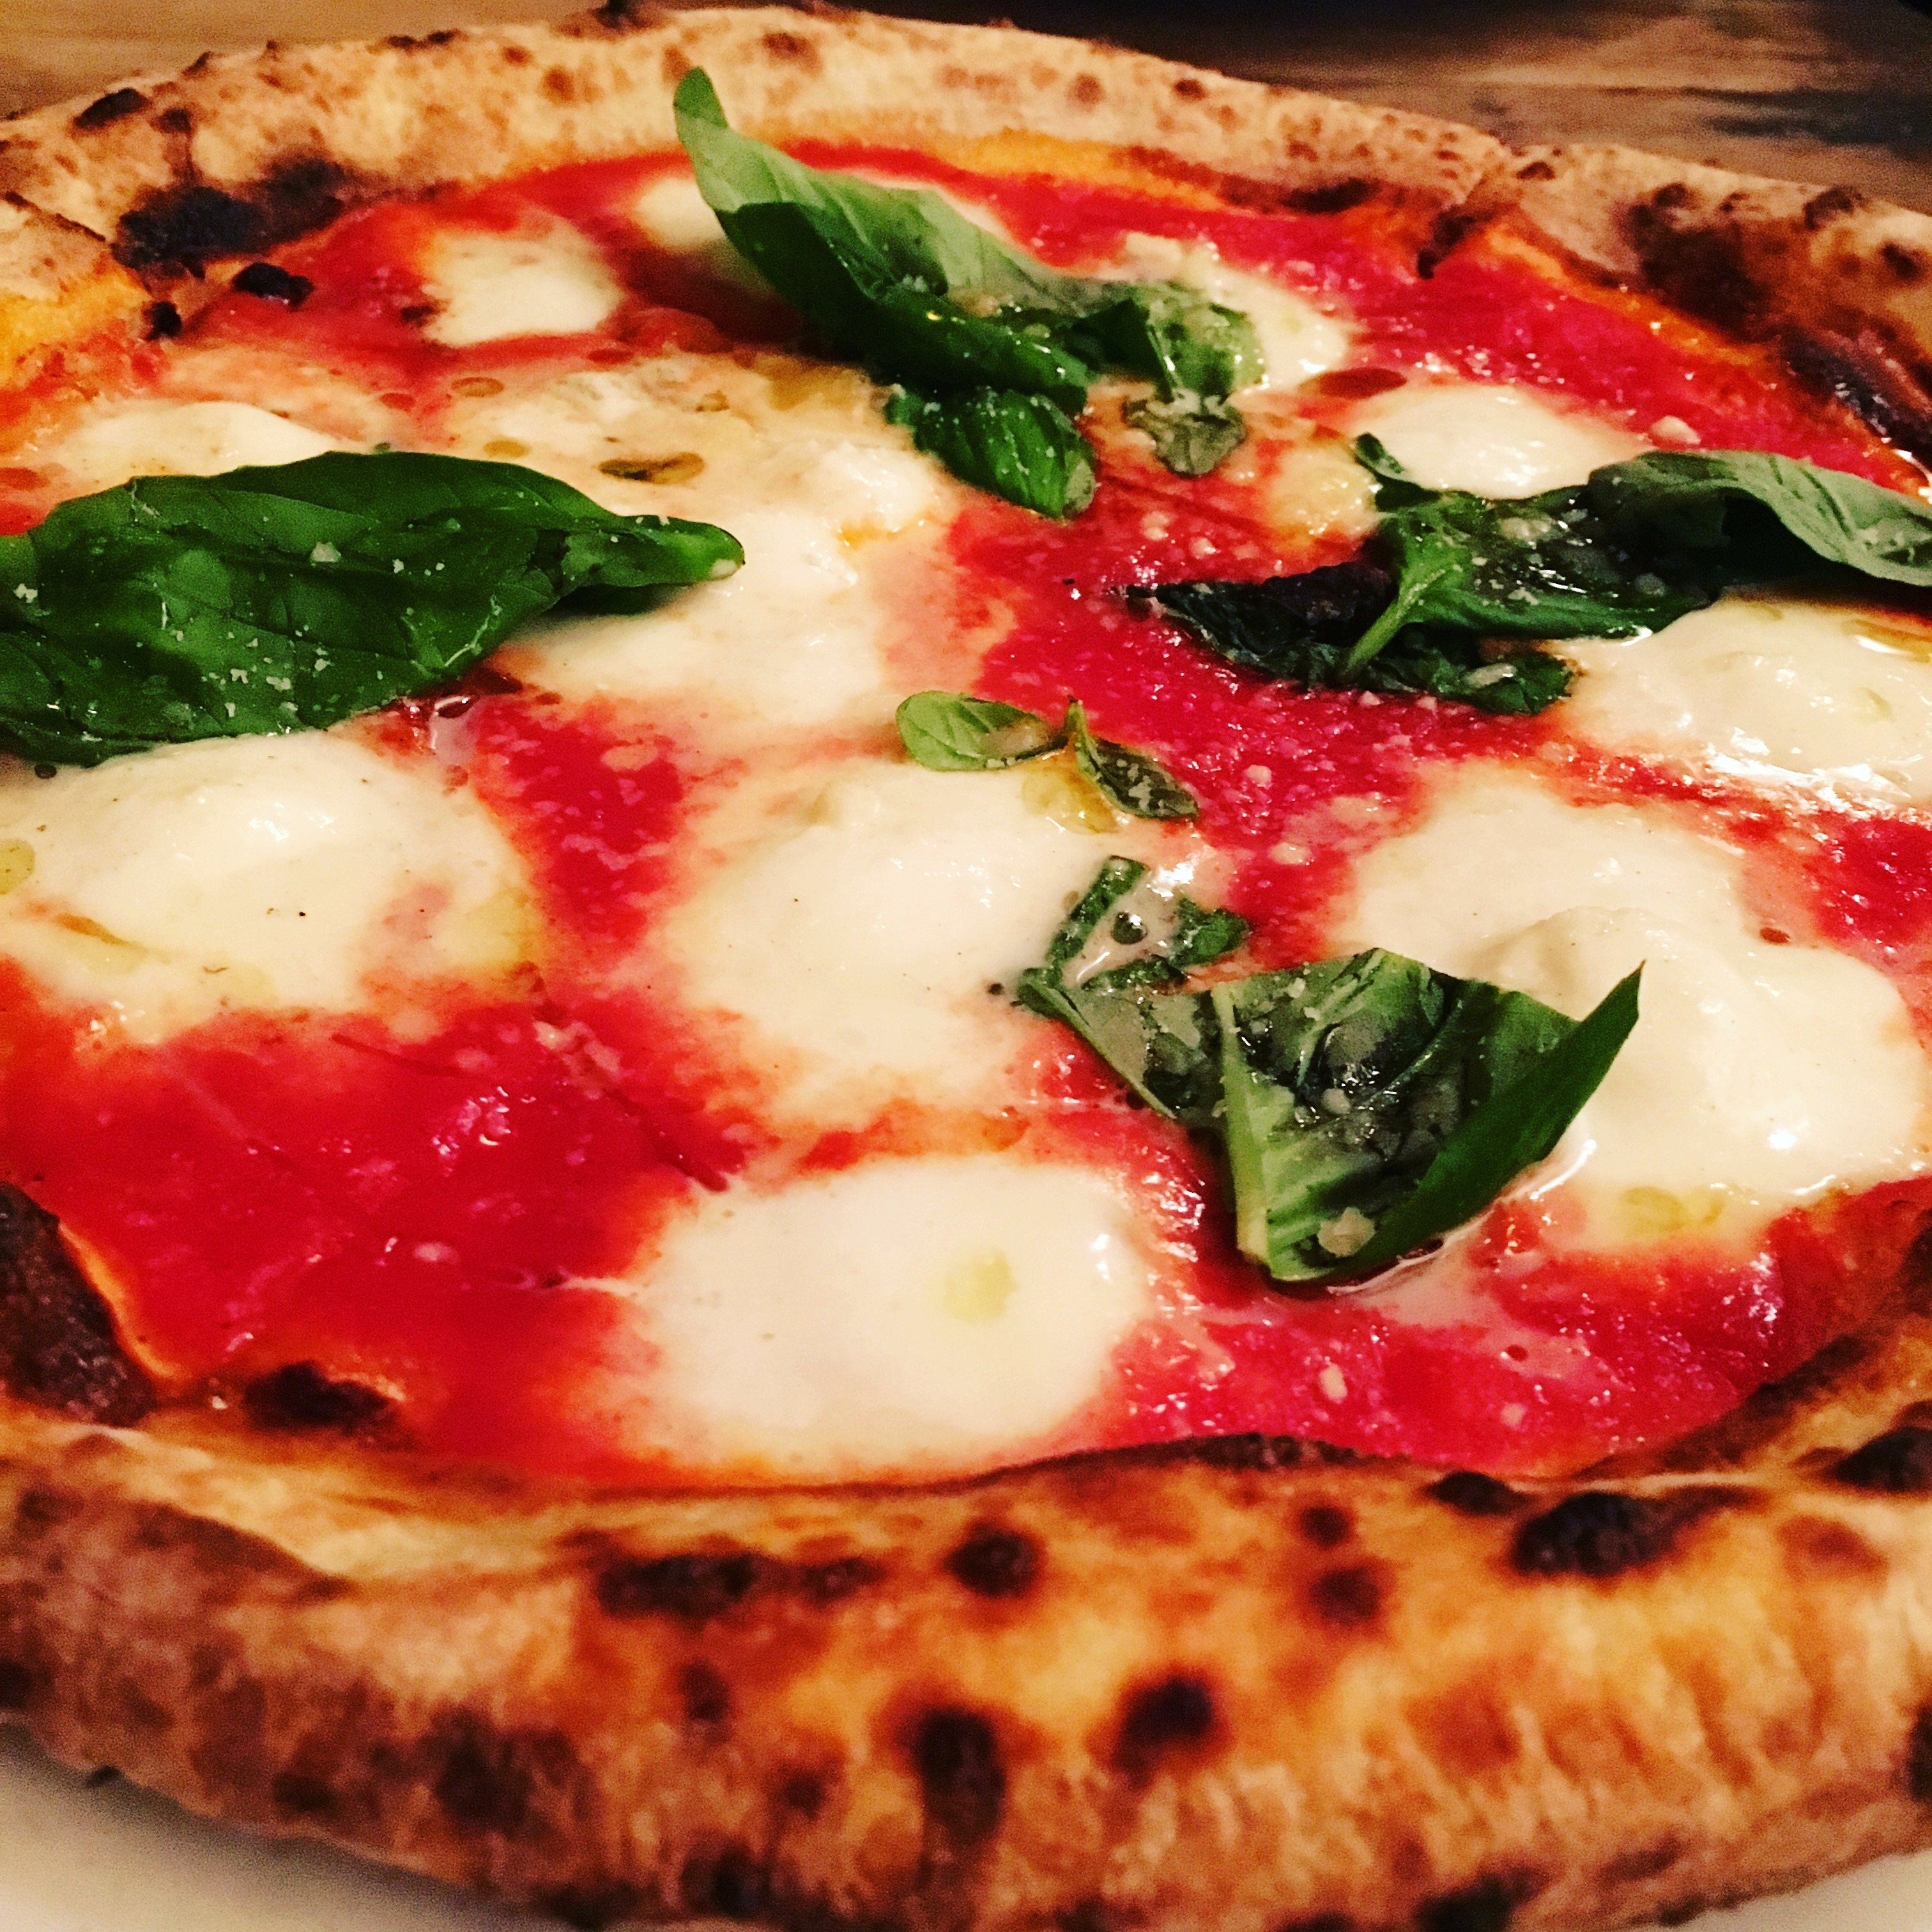 Margherita Pizza At Fornino In Williamsburg Brooklyn 12 26 2015 I May Roam